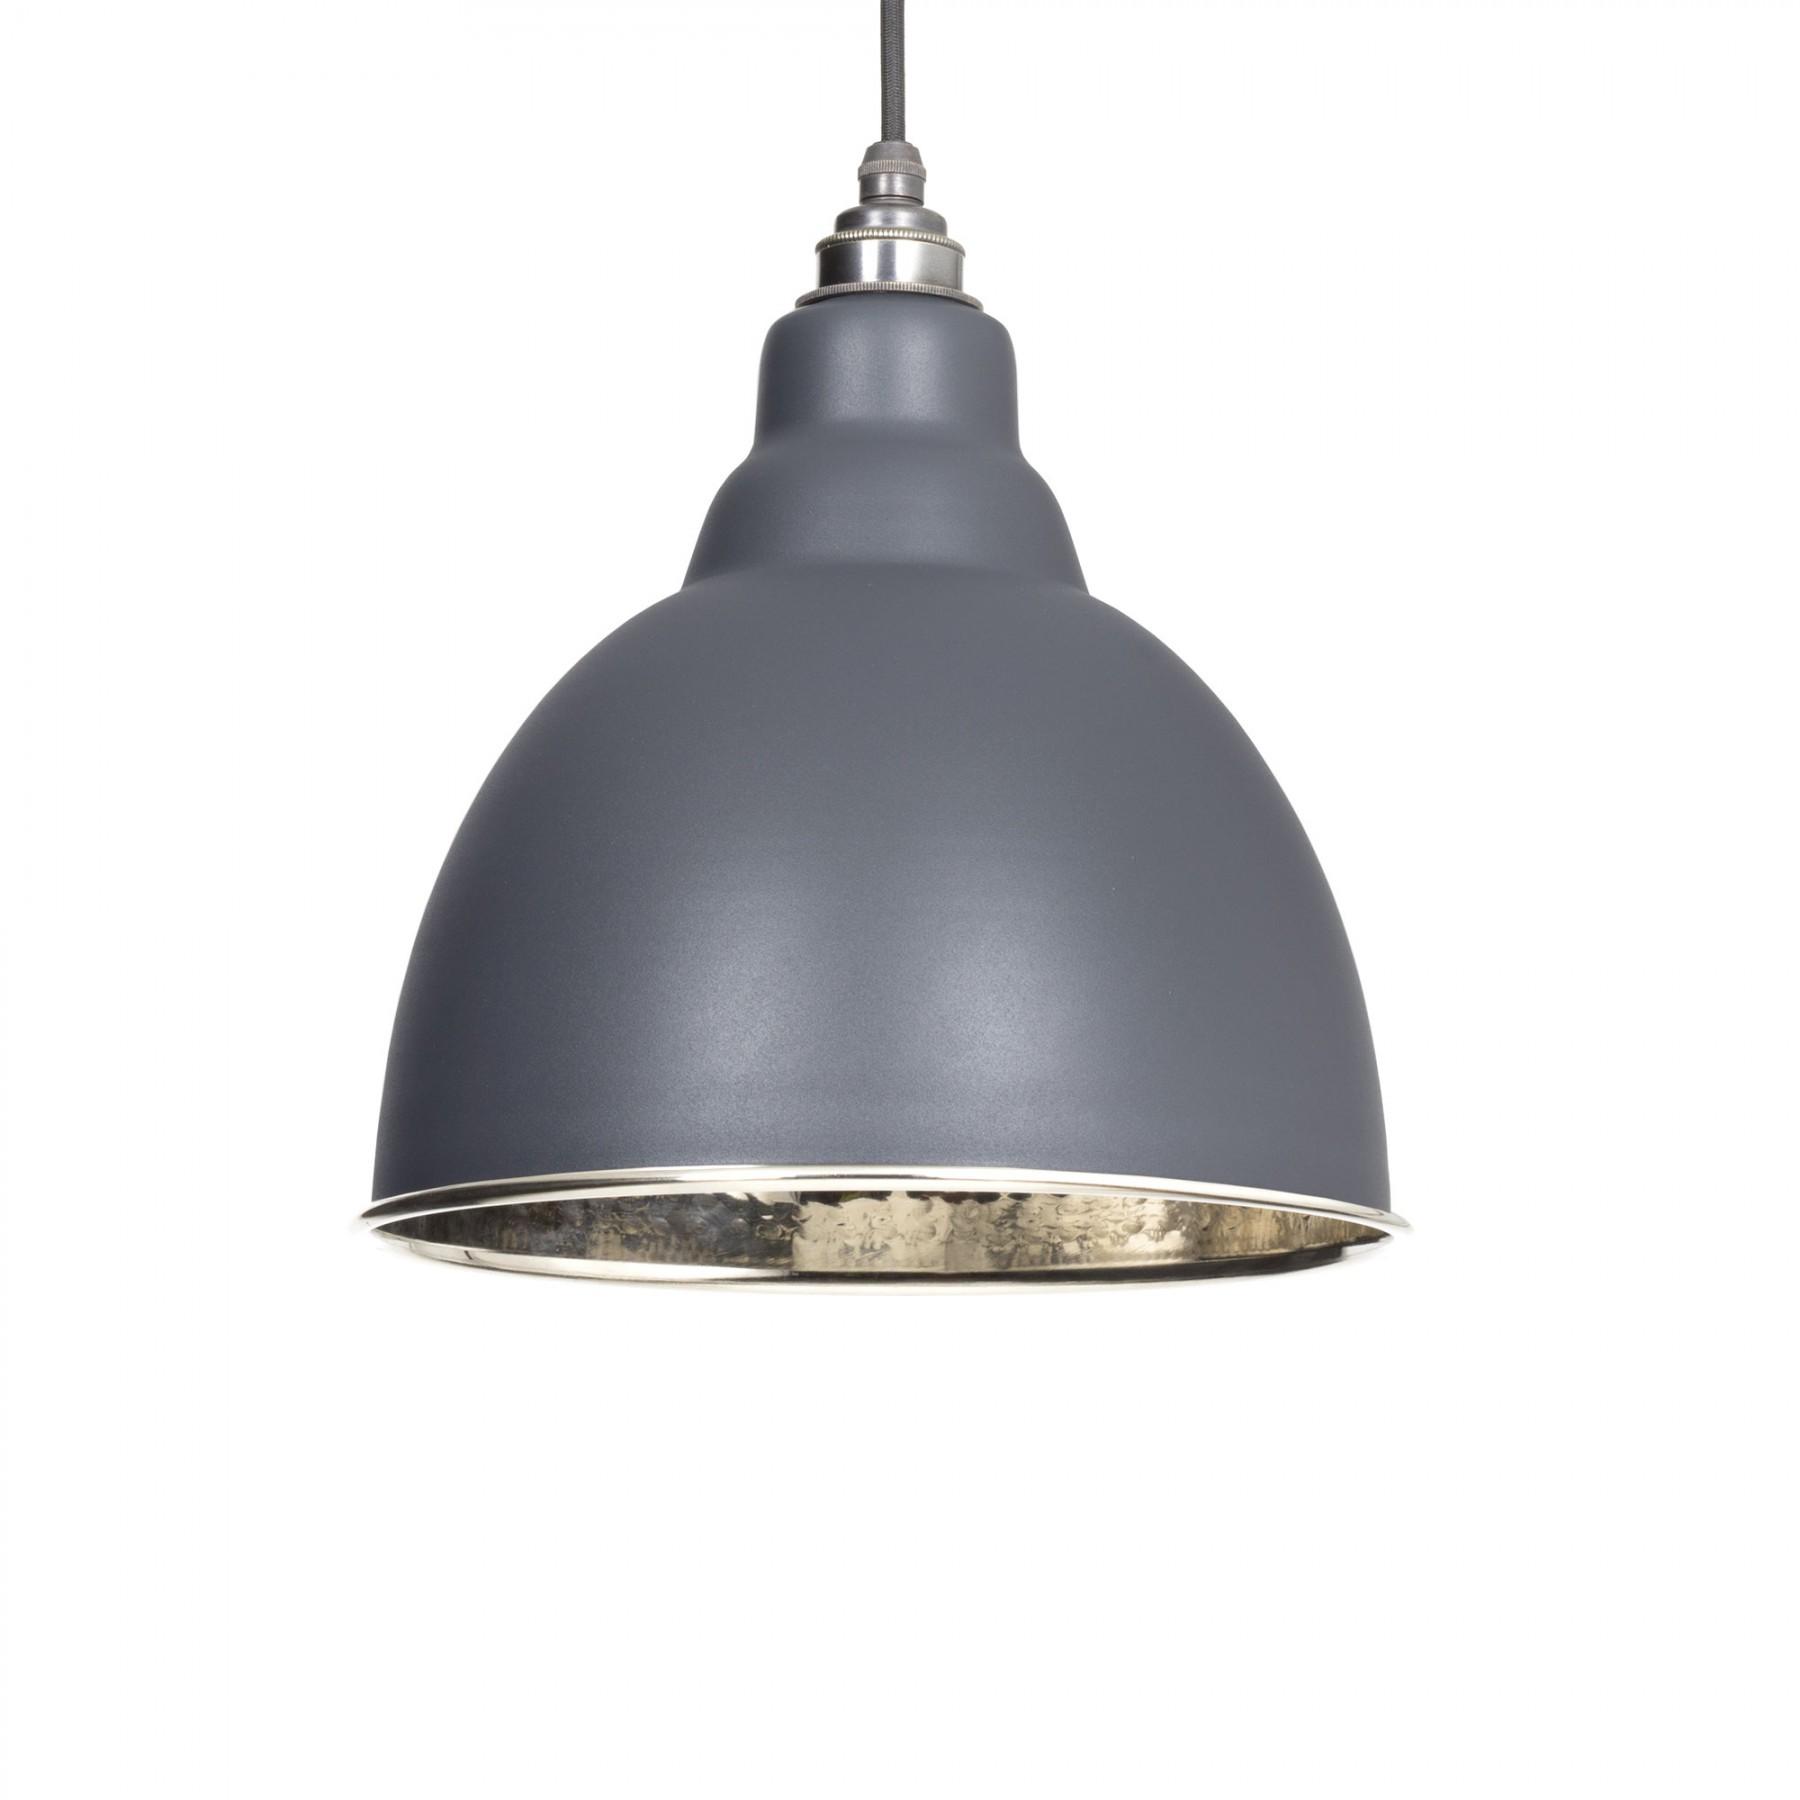 Brindley Pendant - Dark Grey Exterior and Hammered Nickel Interior